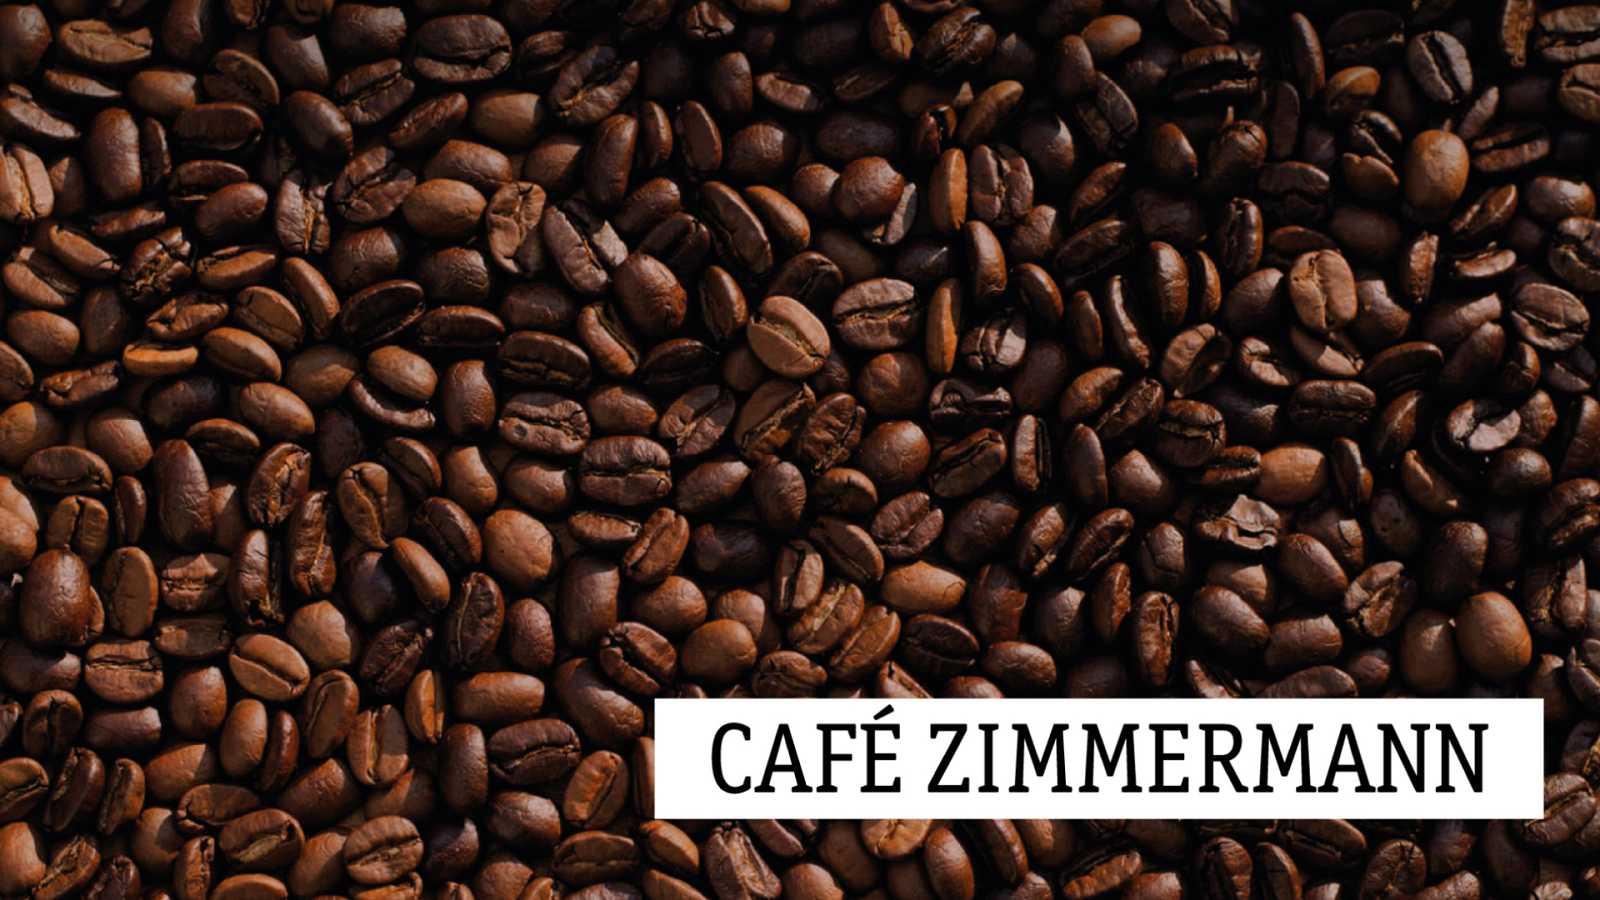 Café Zimmermann - Expreso a Mönchengladbach - 01/03/21 - escuchar ahora